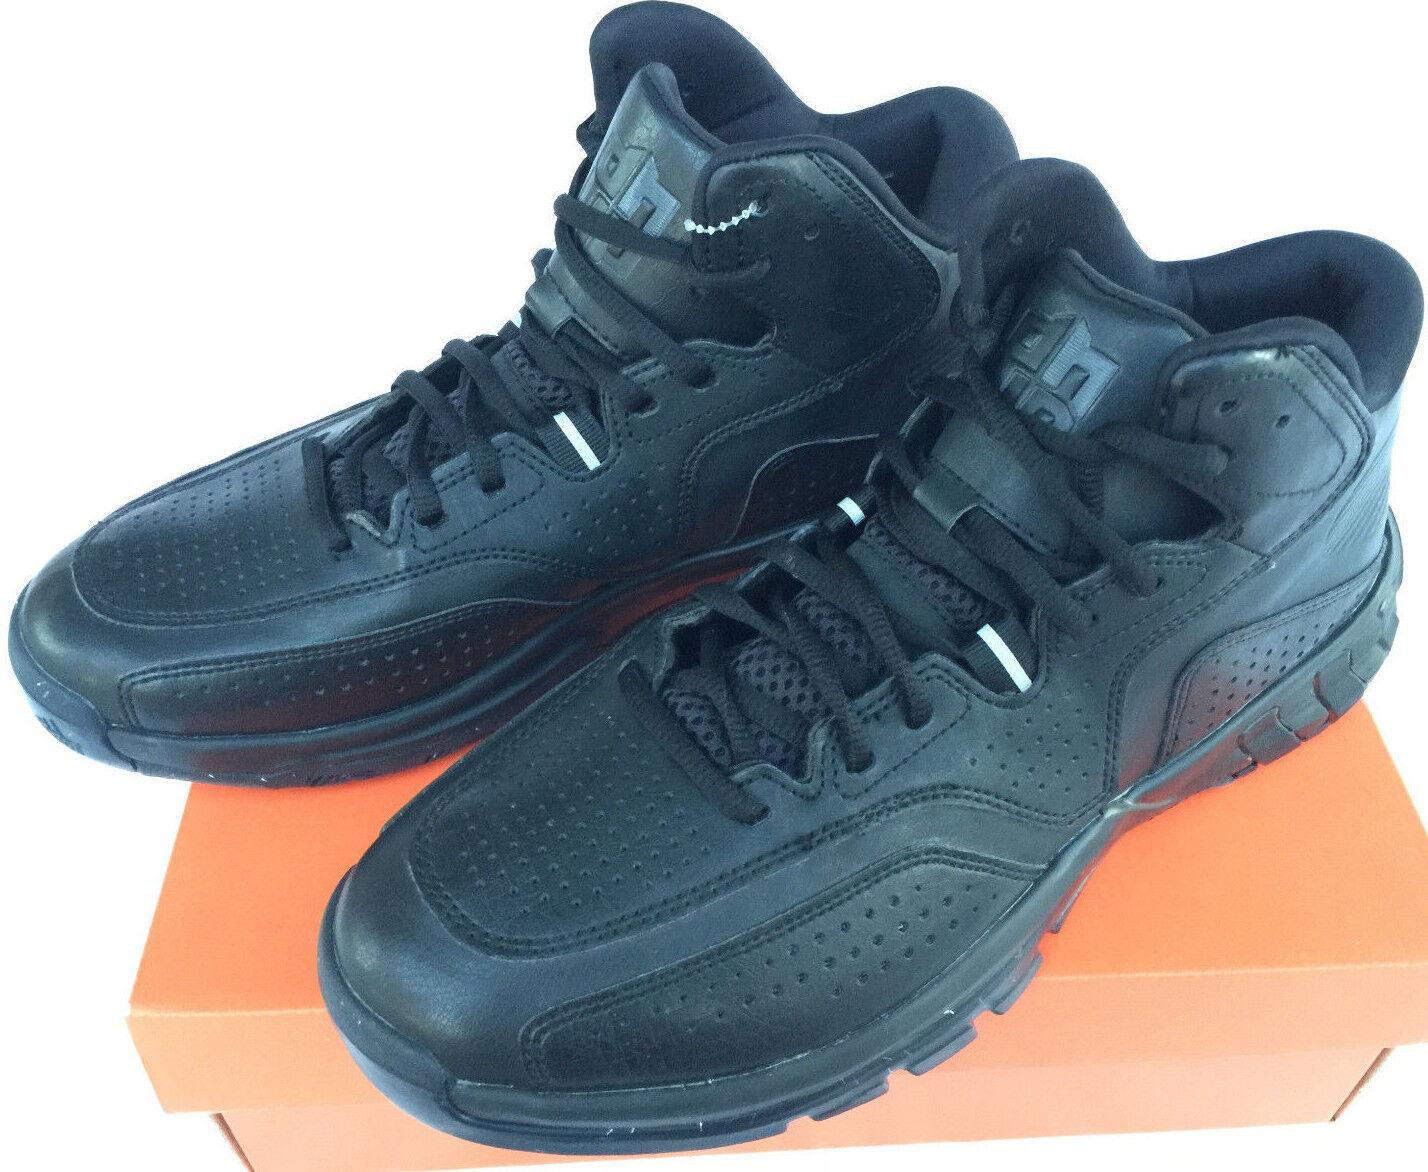 Adidas D Howard 6 Black D69945 Murdered Leather Basketball shoes Men's 11 Hawks